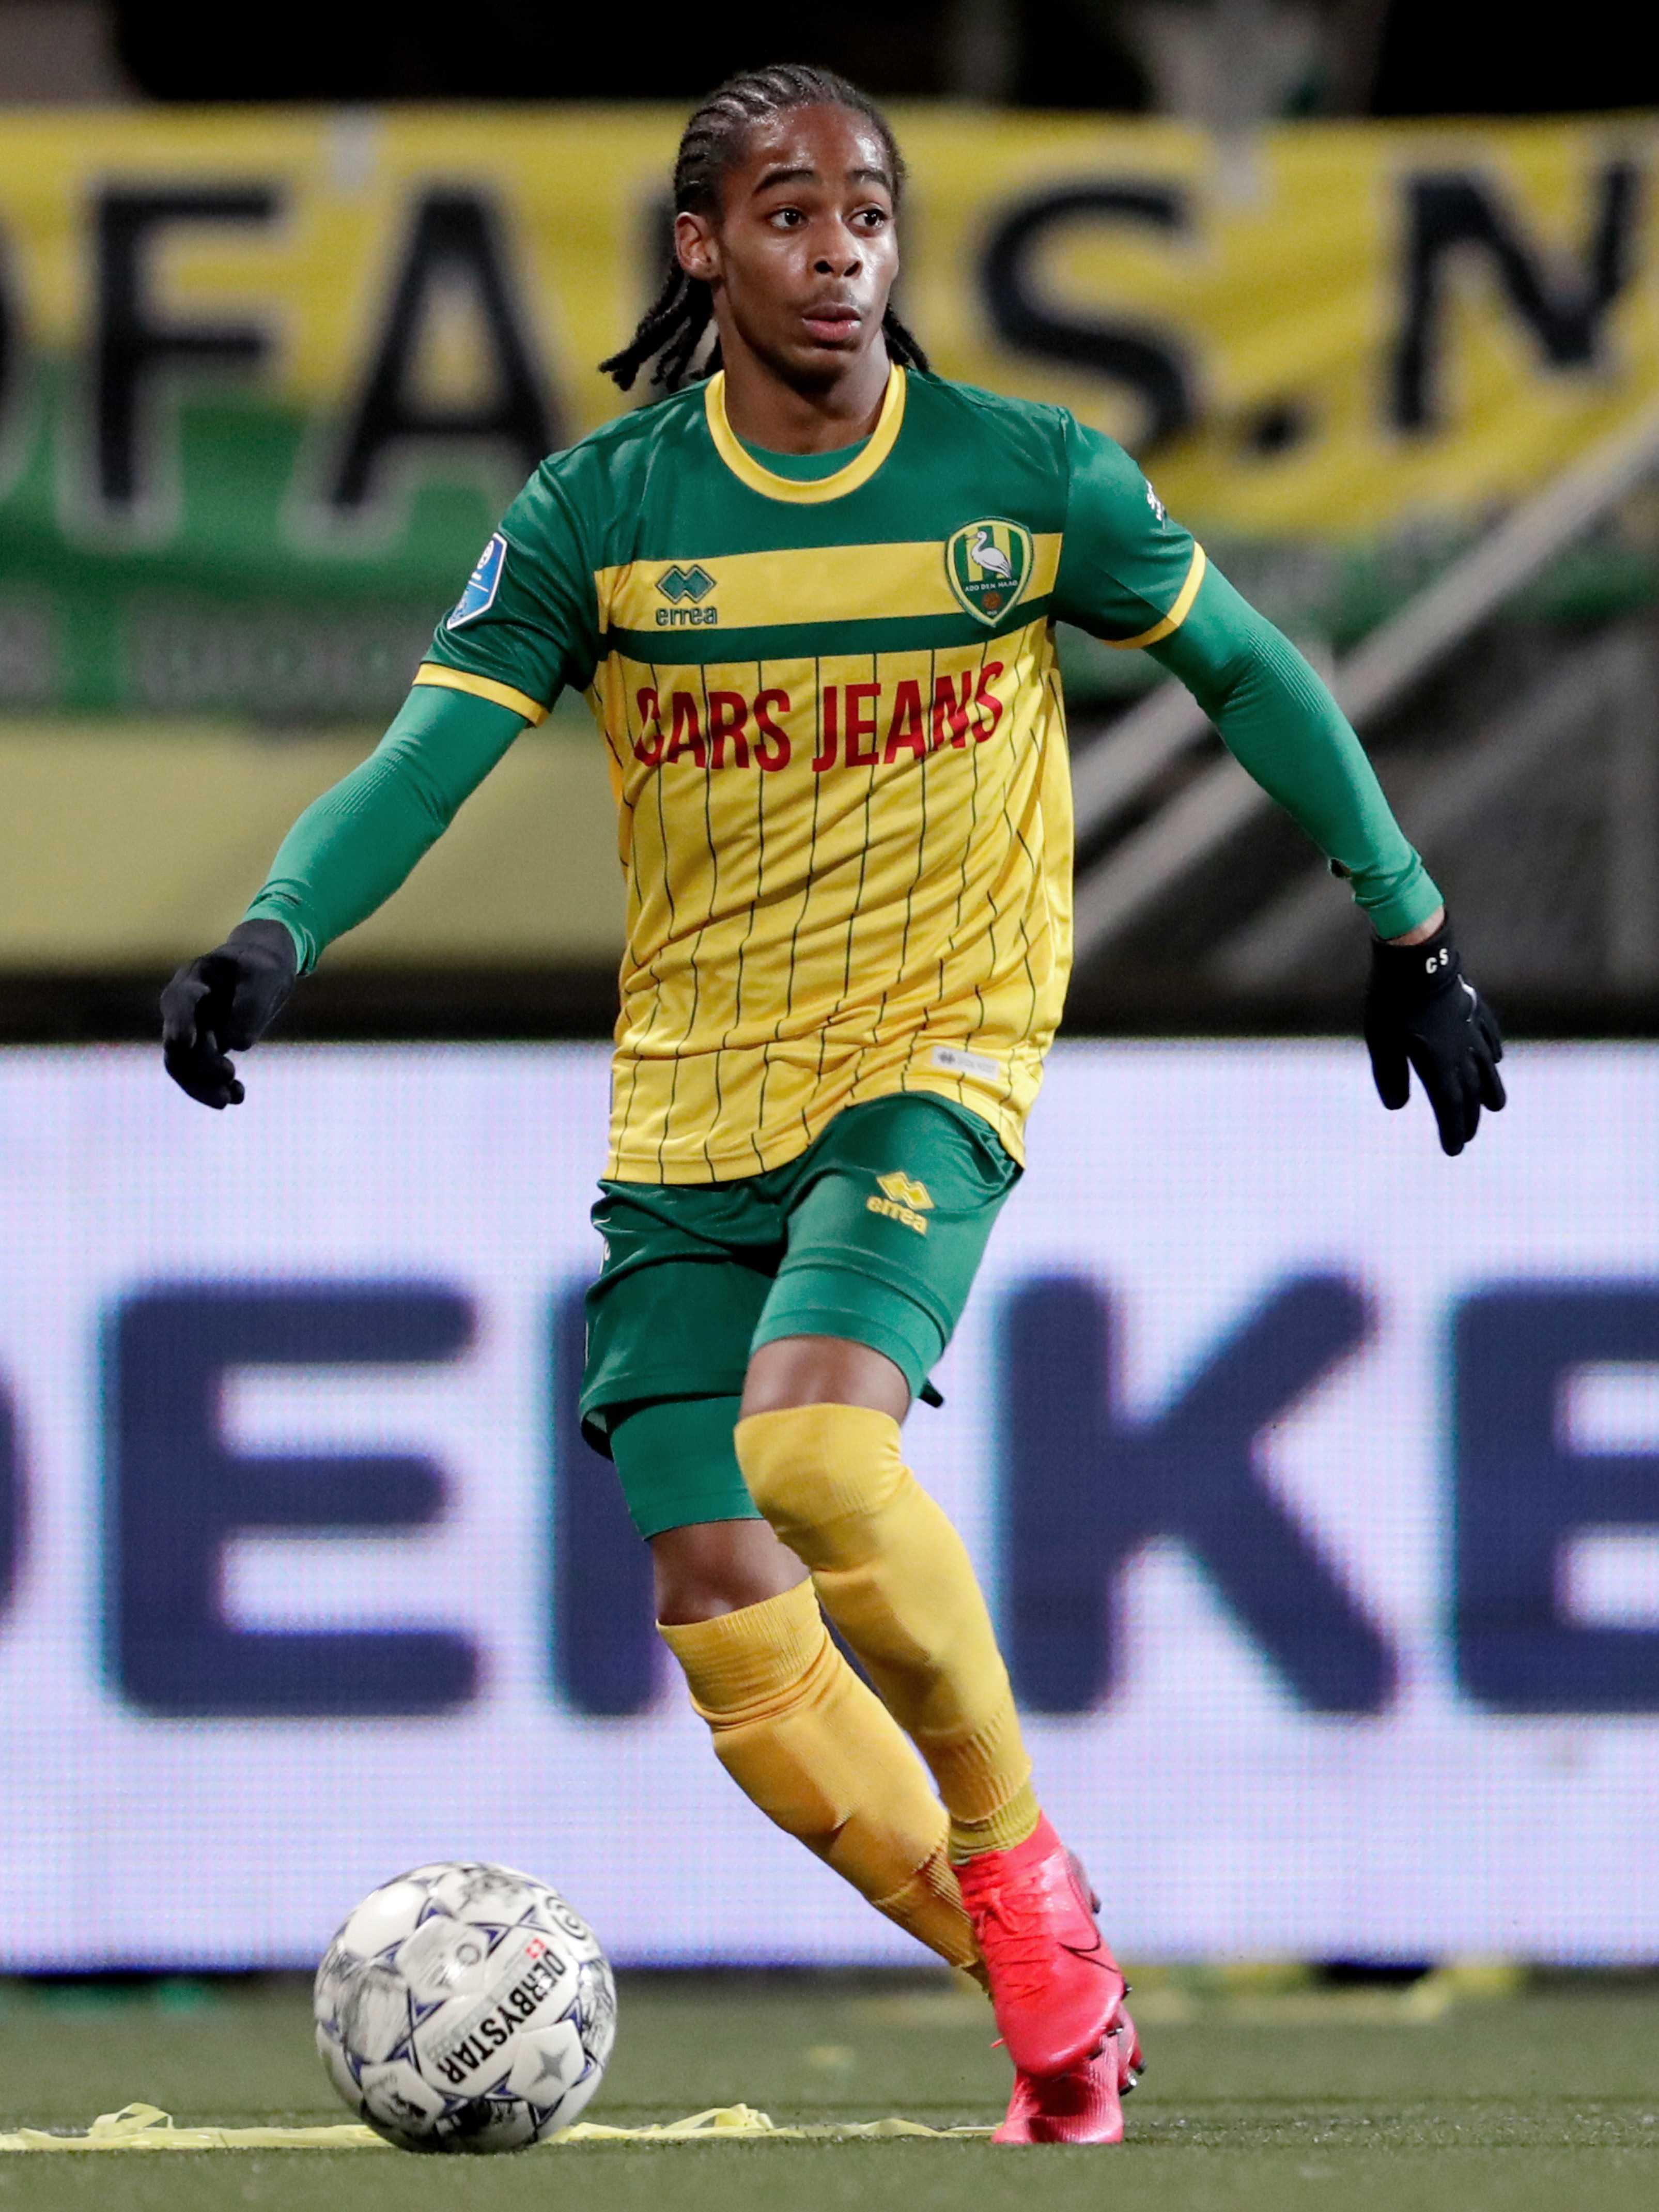 Scooper Nigeria Football News Leeds Set To Snap Up Feyenoord Winger Crysencio Summerville 18 In 1 3m Transfer With Talks Progressing